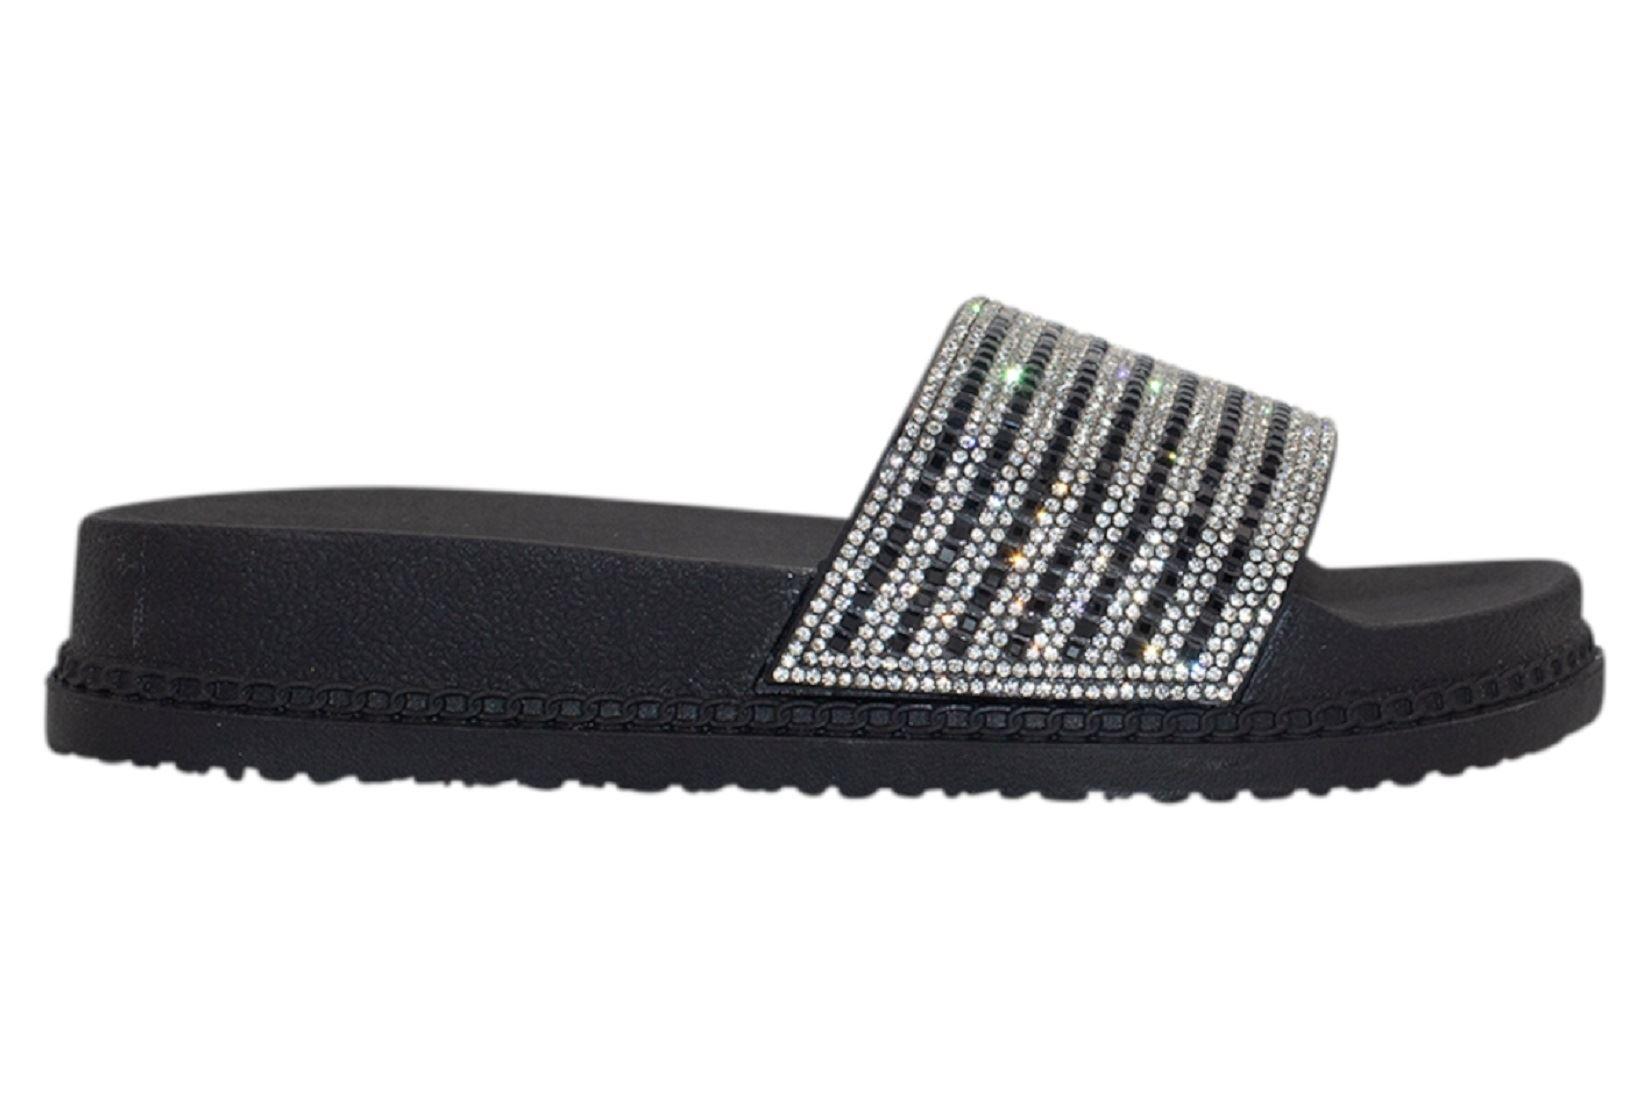 Womens-Sliders-Casual-Slippers-Mules-Ladies-Diamante-Flip-Flop-Sandals-Shoes thumbnail 9